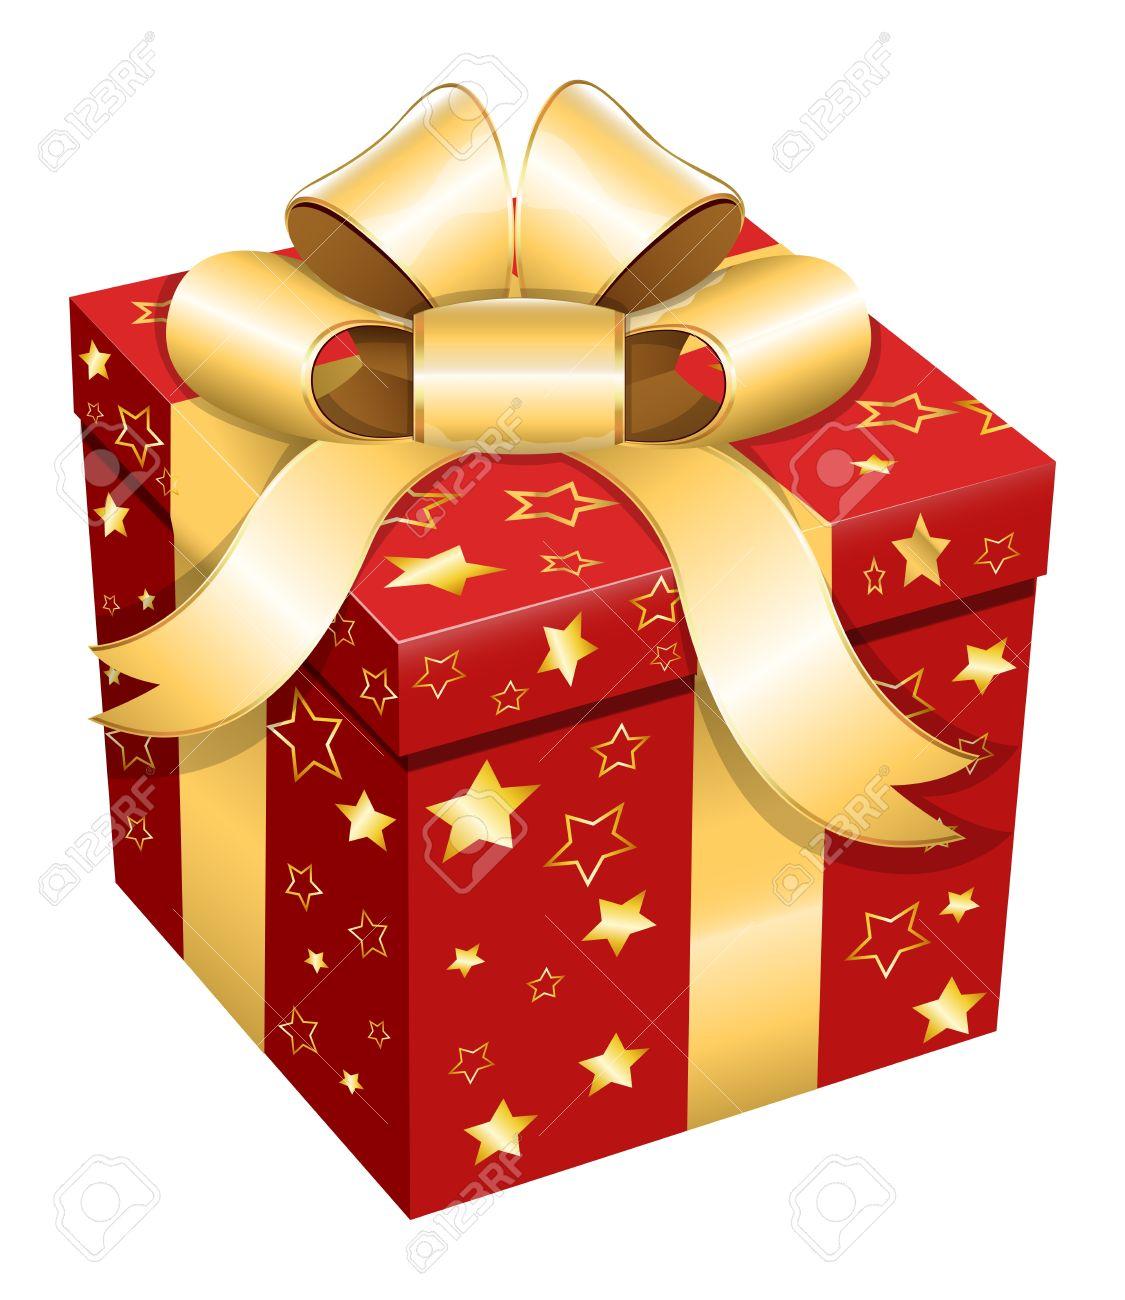 Gift Box - Christmas Illustration Royalty Free Cliparts, Vectors ...